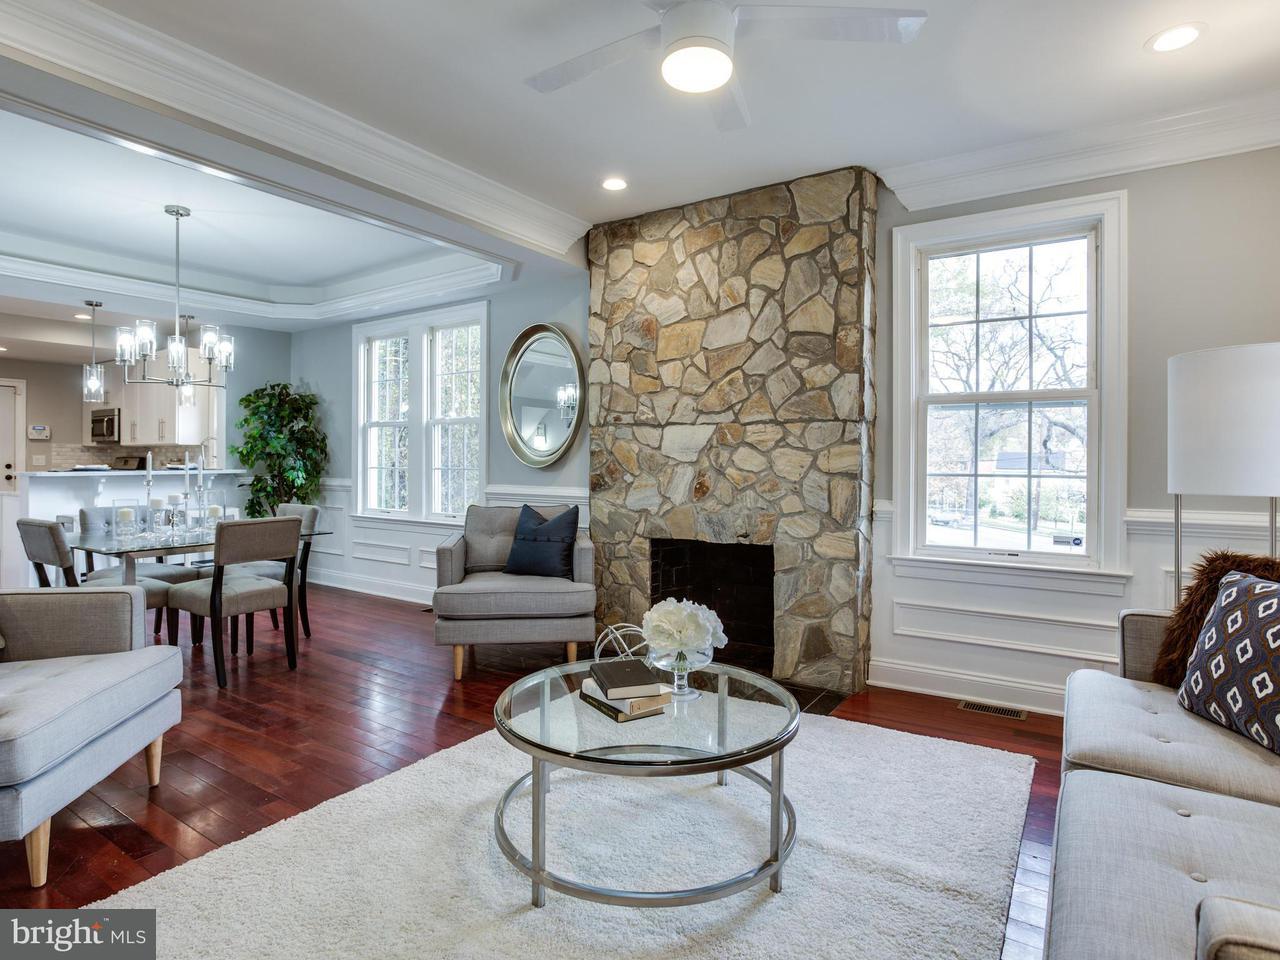 Single Family Home for Sale at 3716 31ST PL NE 3716 31ST PL NE Washington, District Of Columbia 20018 United States